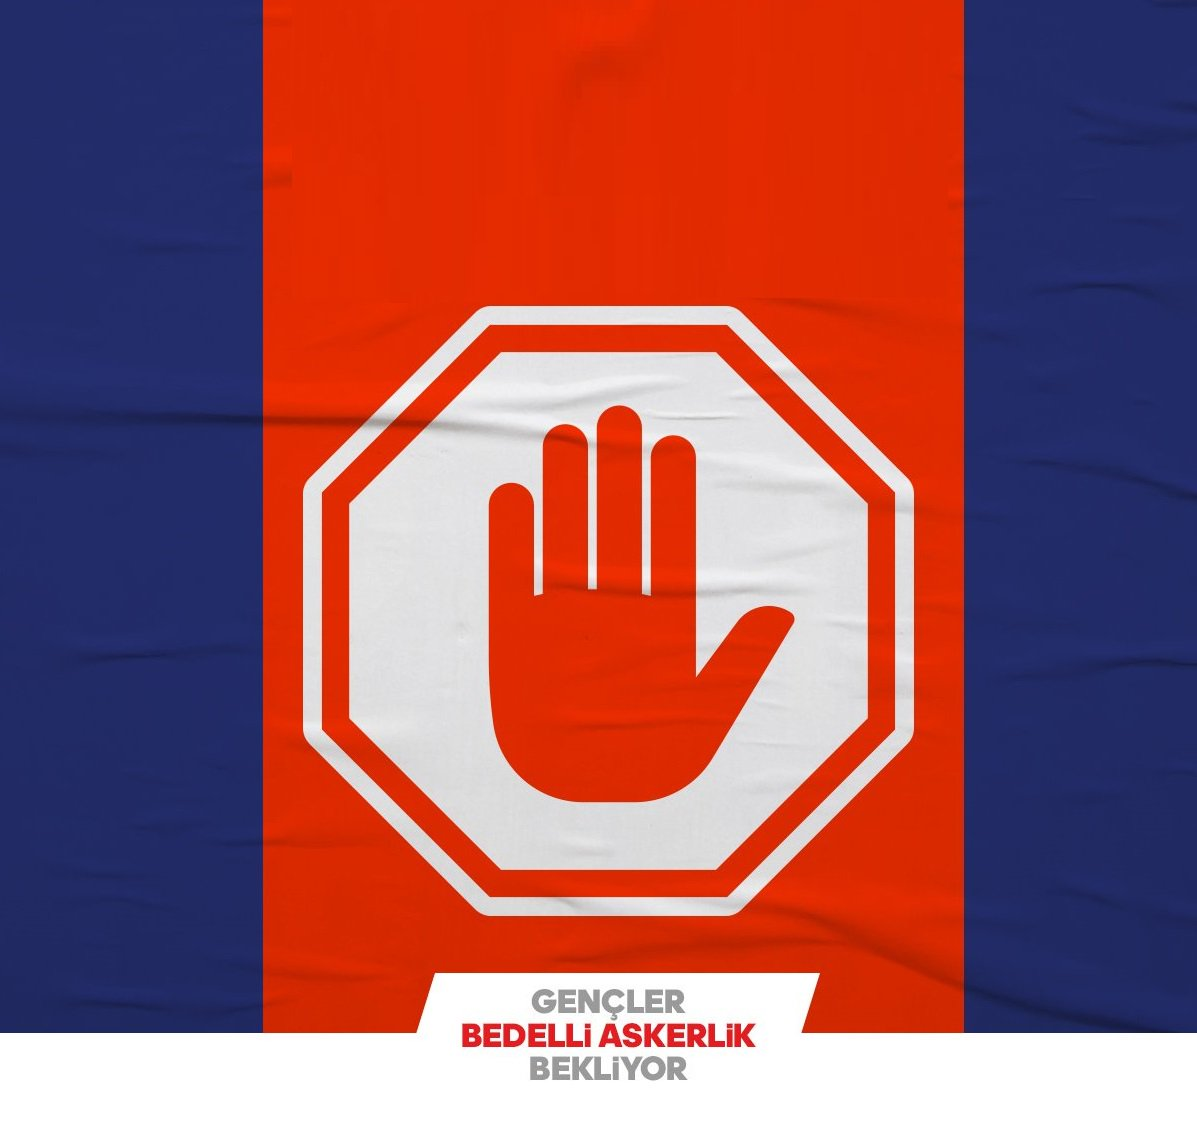 Ferhat DOĞAN's photo on #BedelliAskerlik